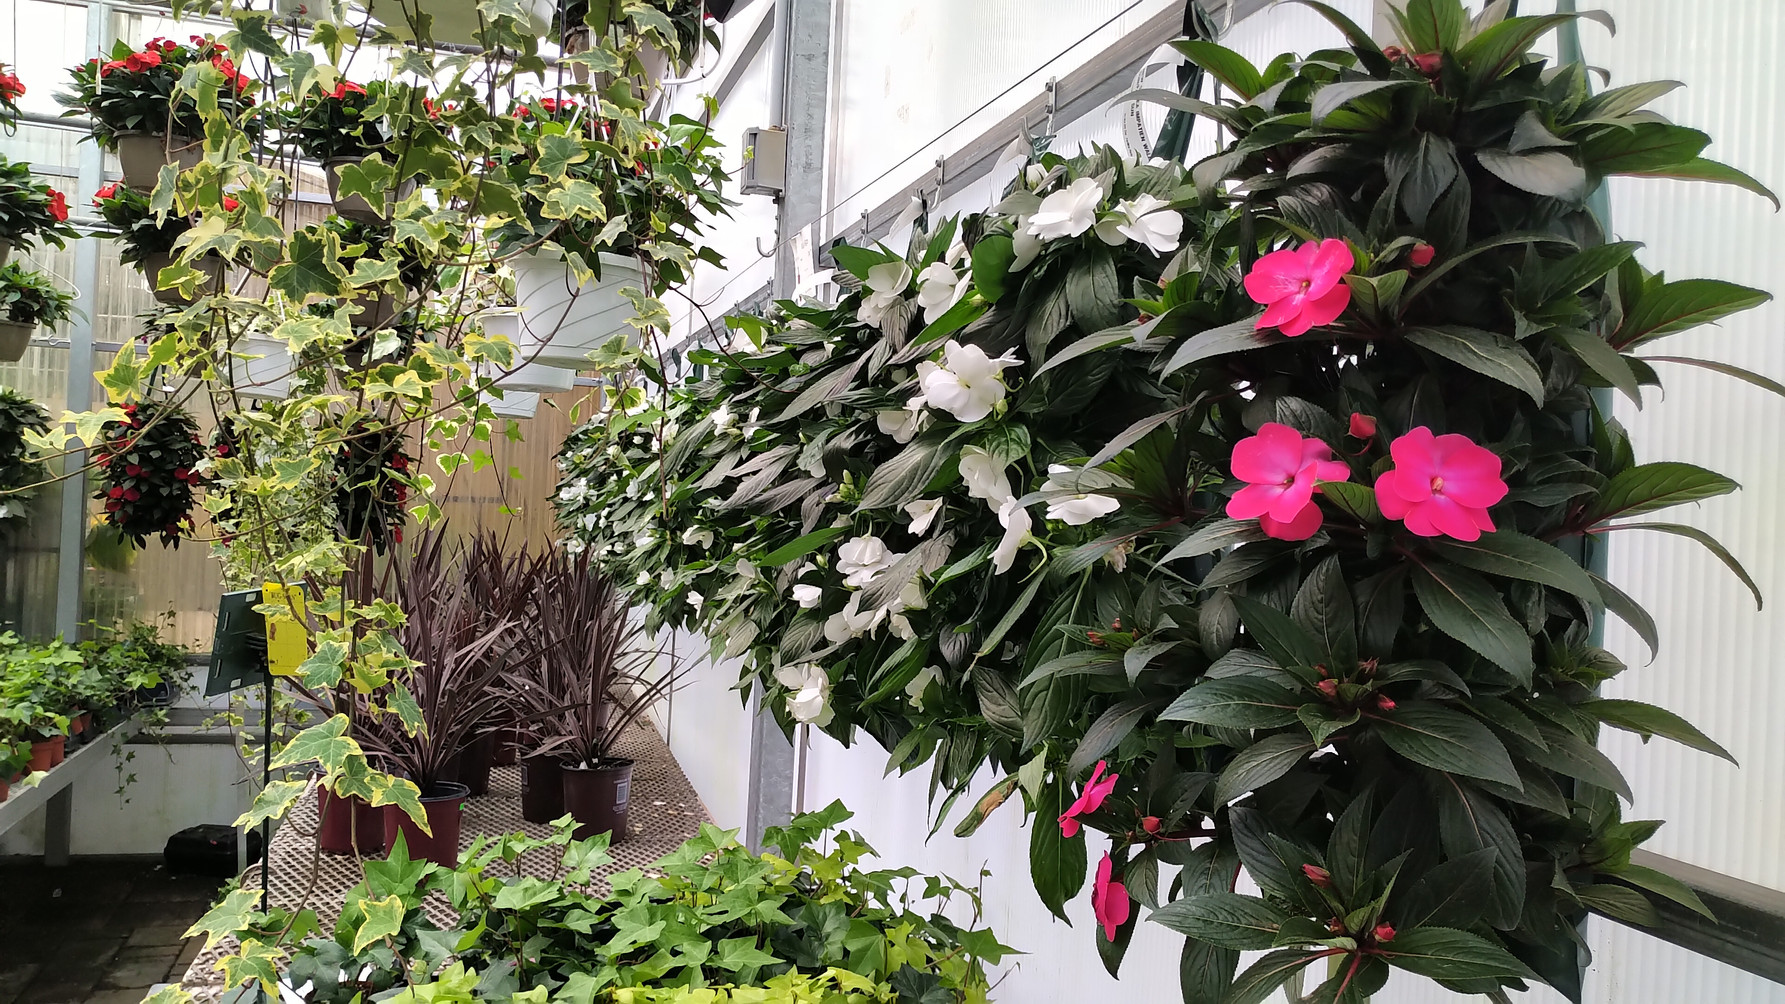 Optimizing space @ Woodhill Garden Centre